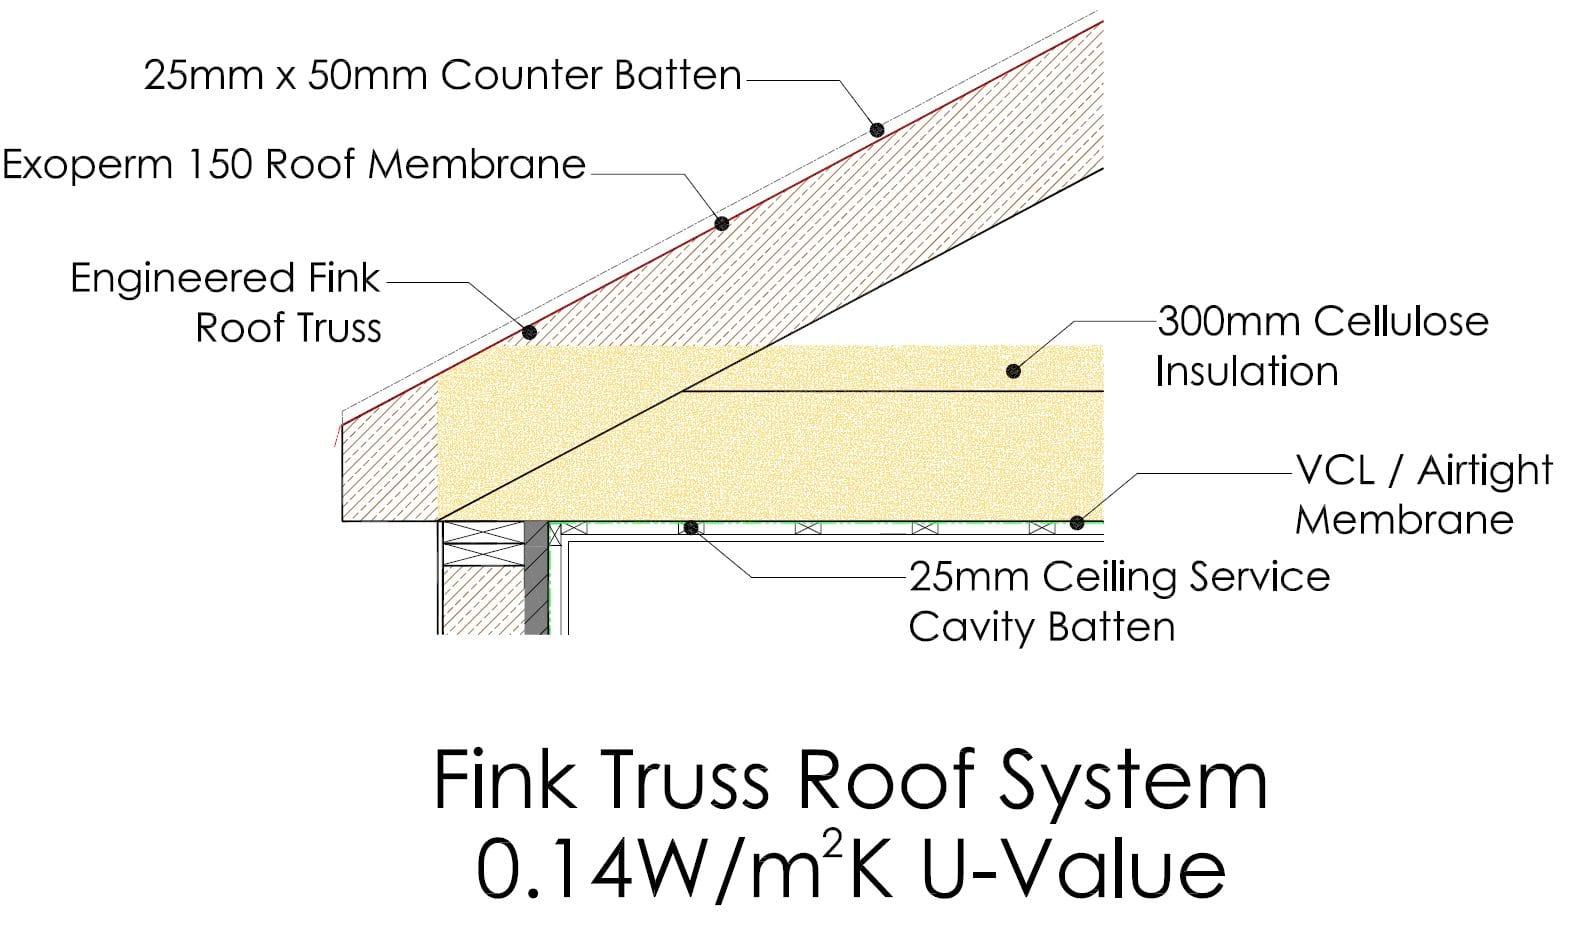 Fink Truss Roof System U-Value 0.14